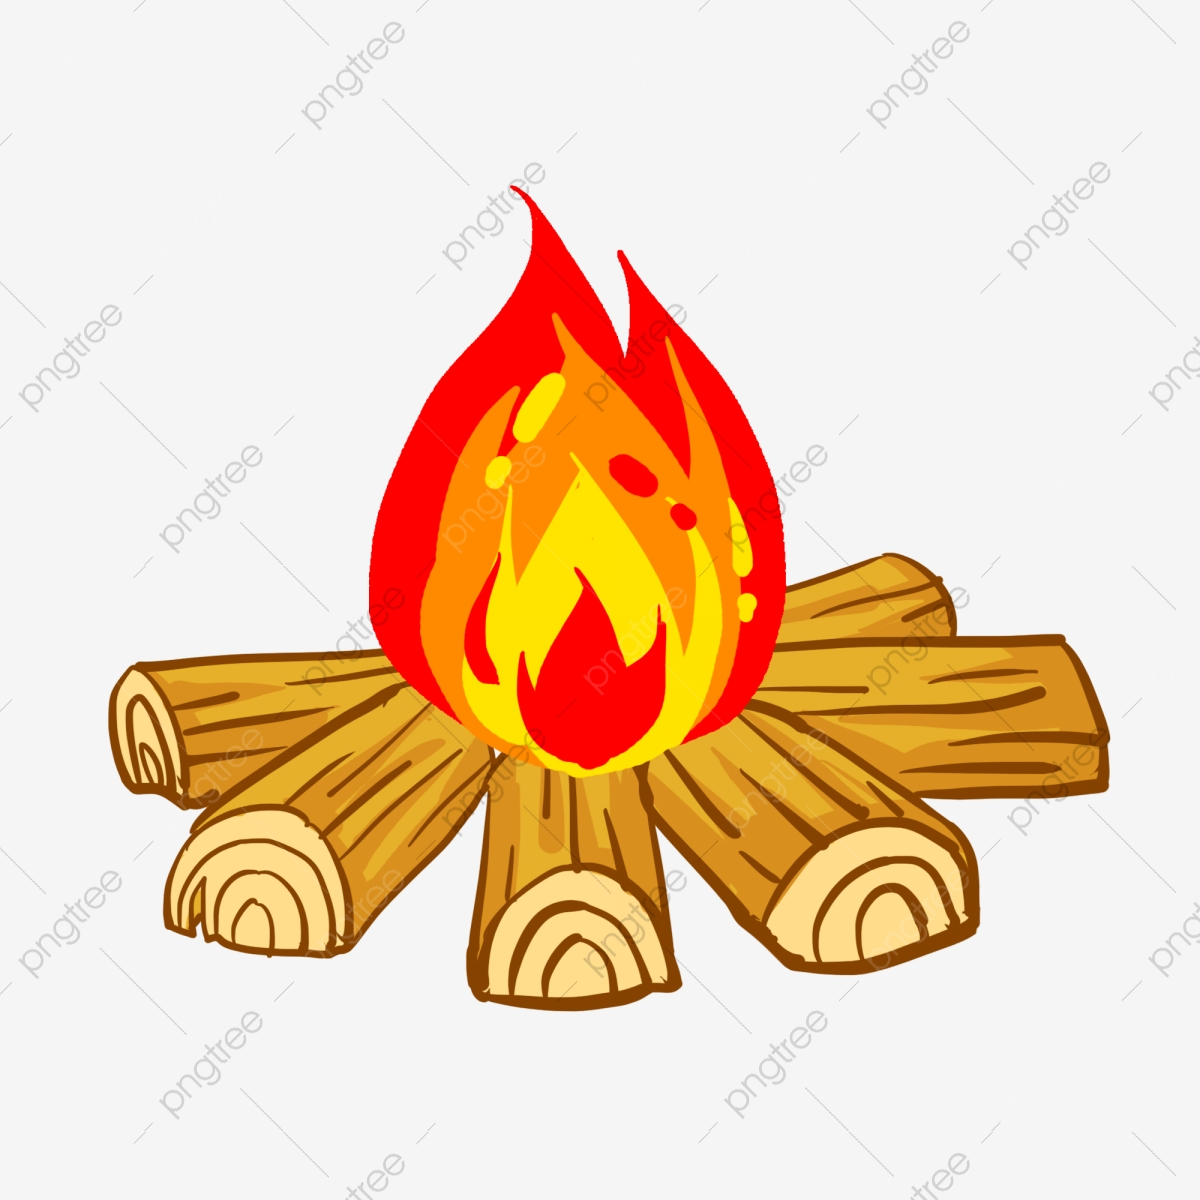 8800 Gambar Api Unggun Kartun Hitam Putih Gratis Terbaik